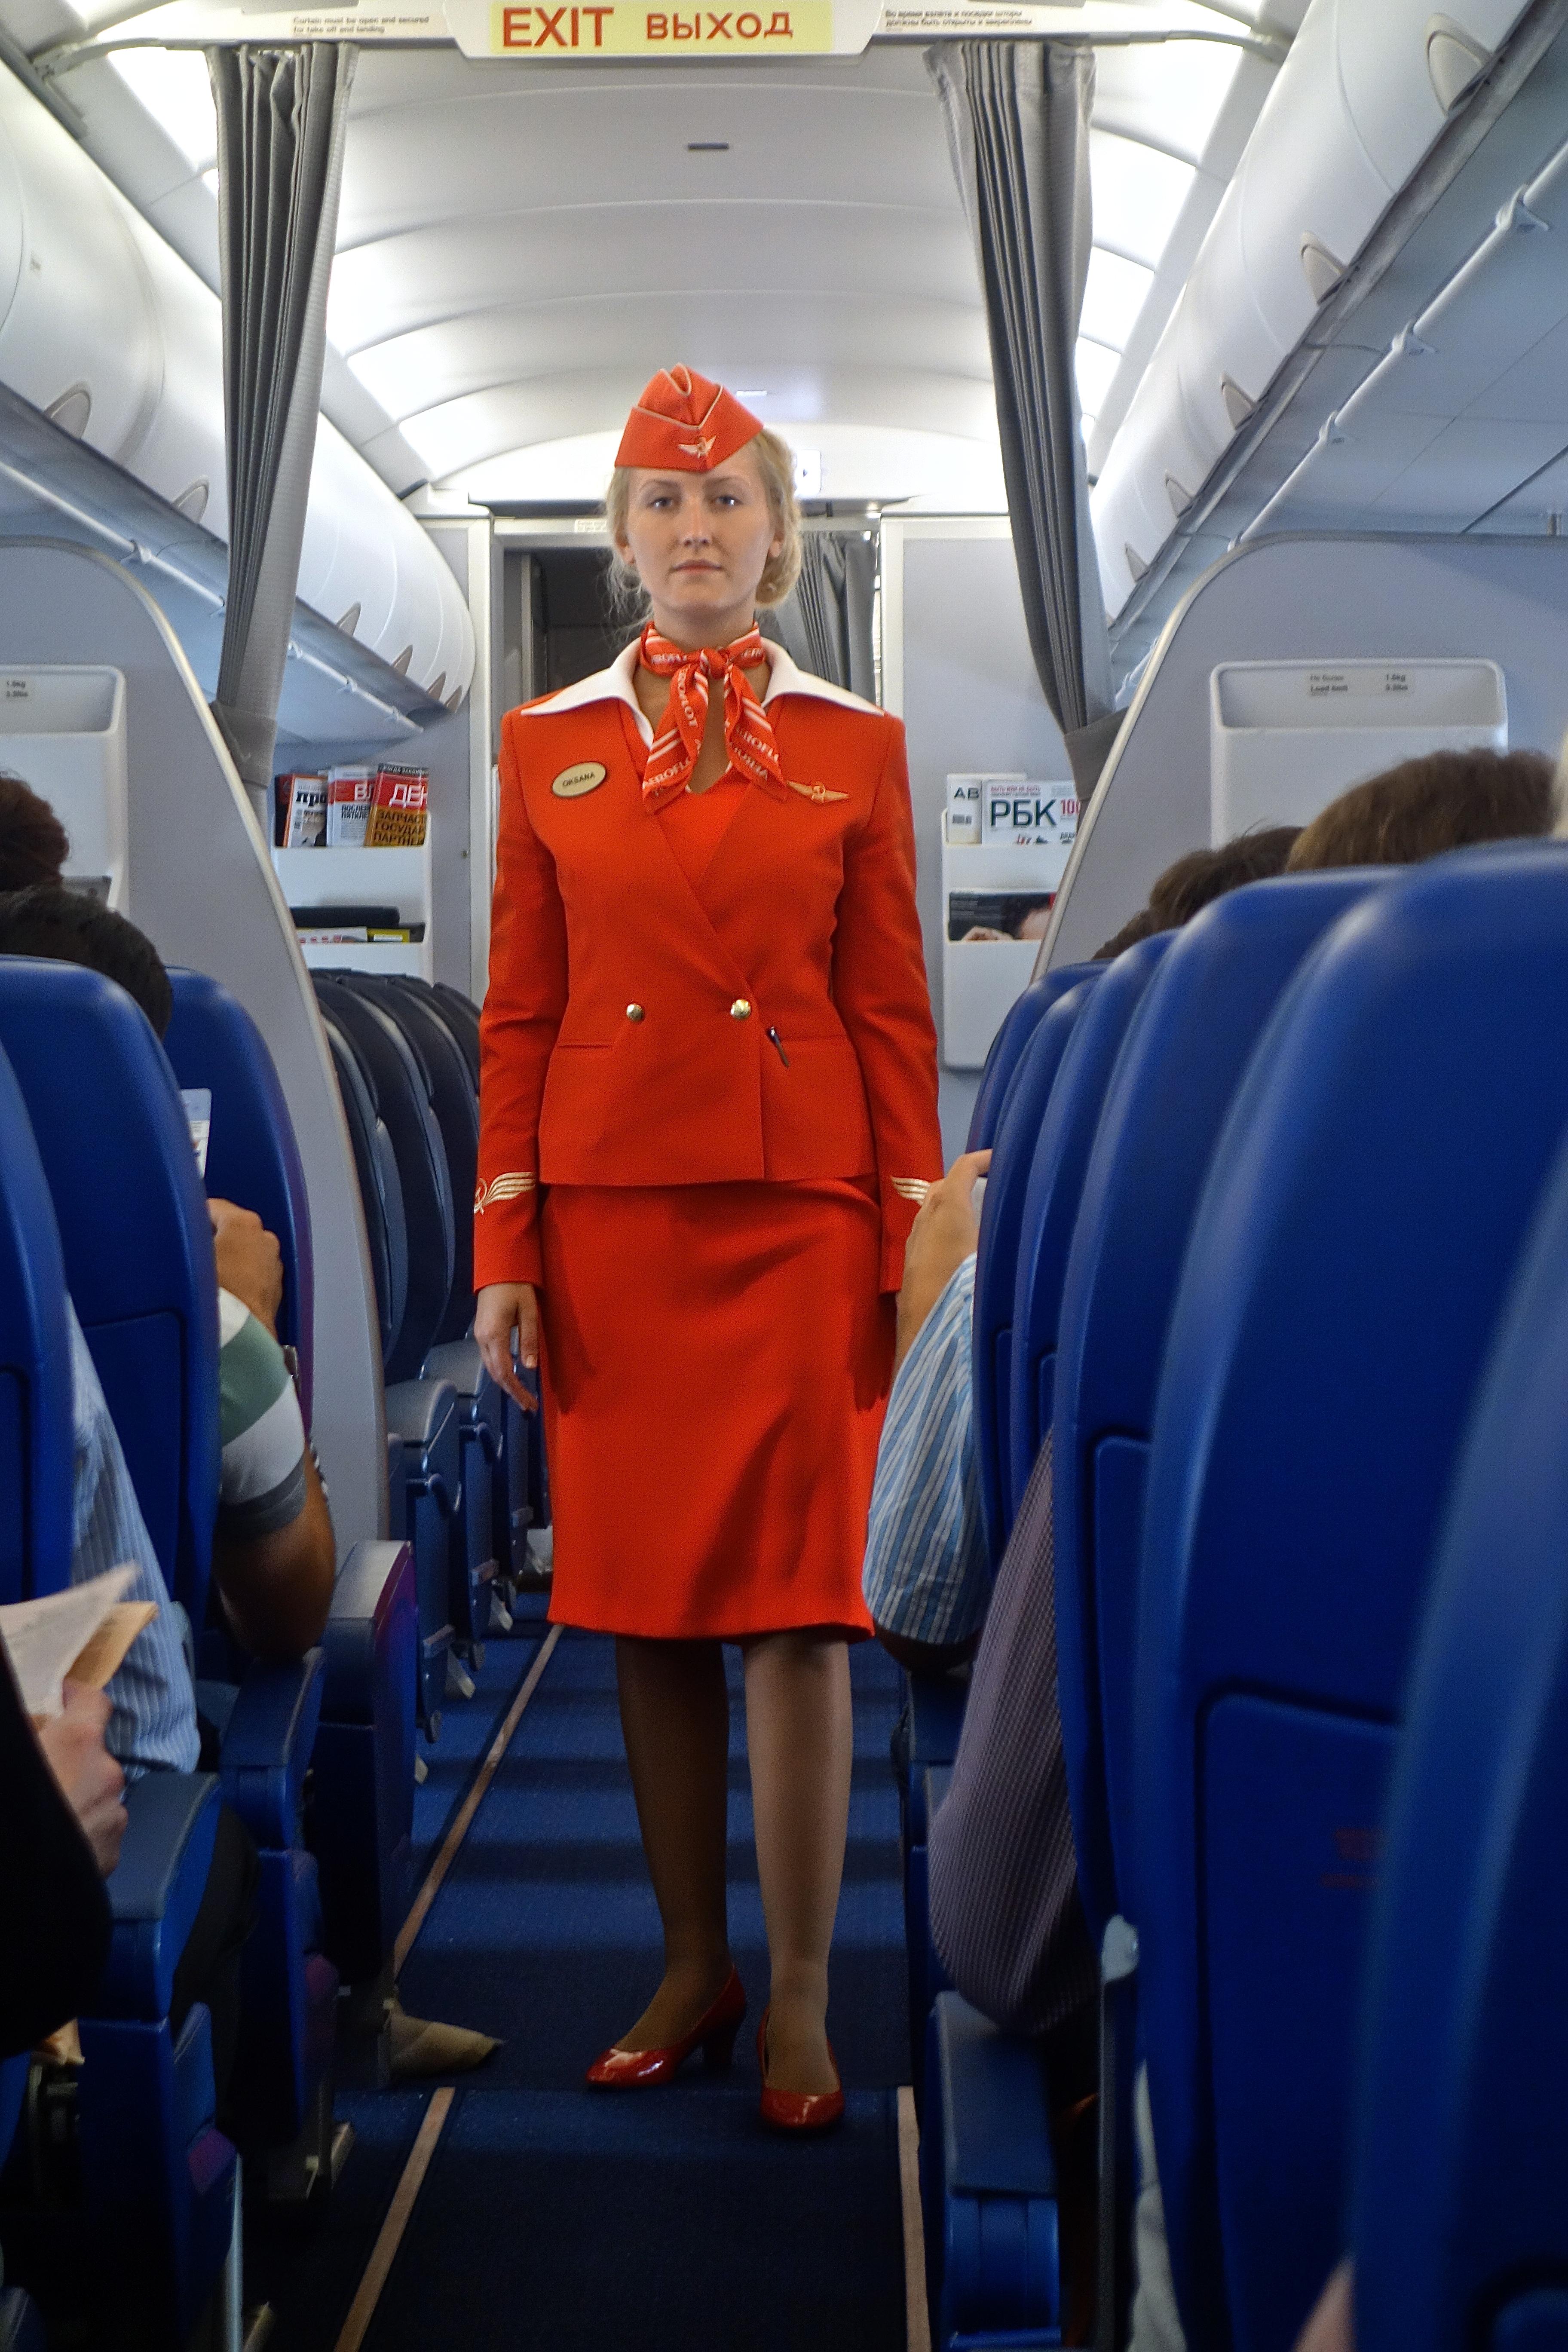 aeroflot attendant Image